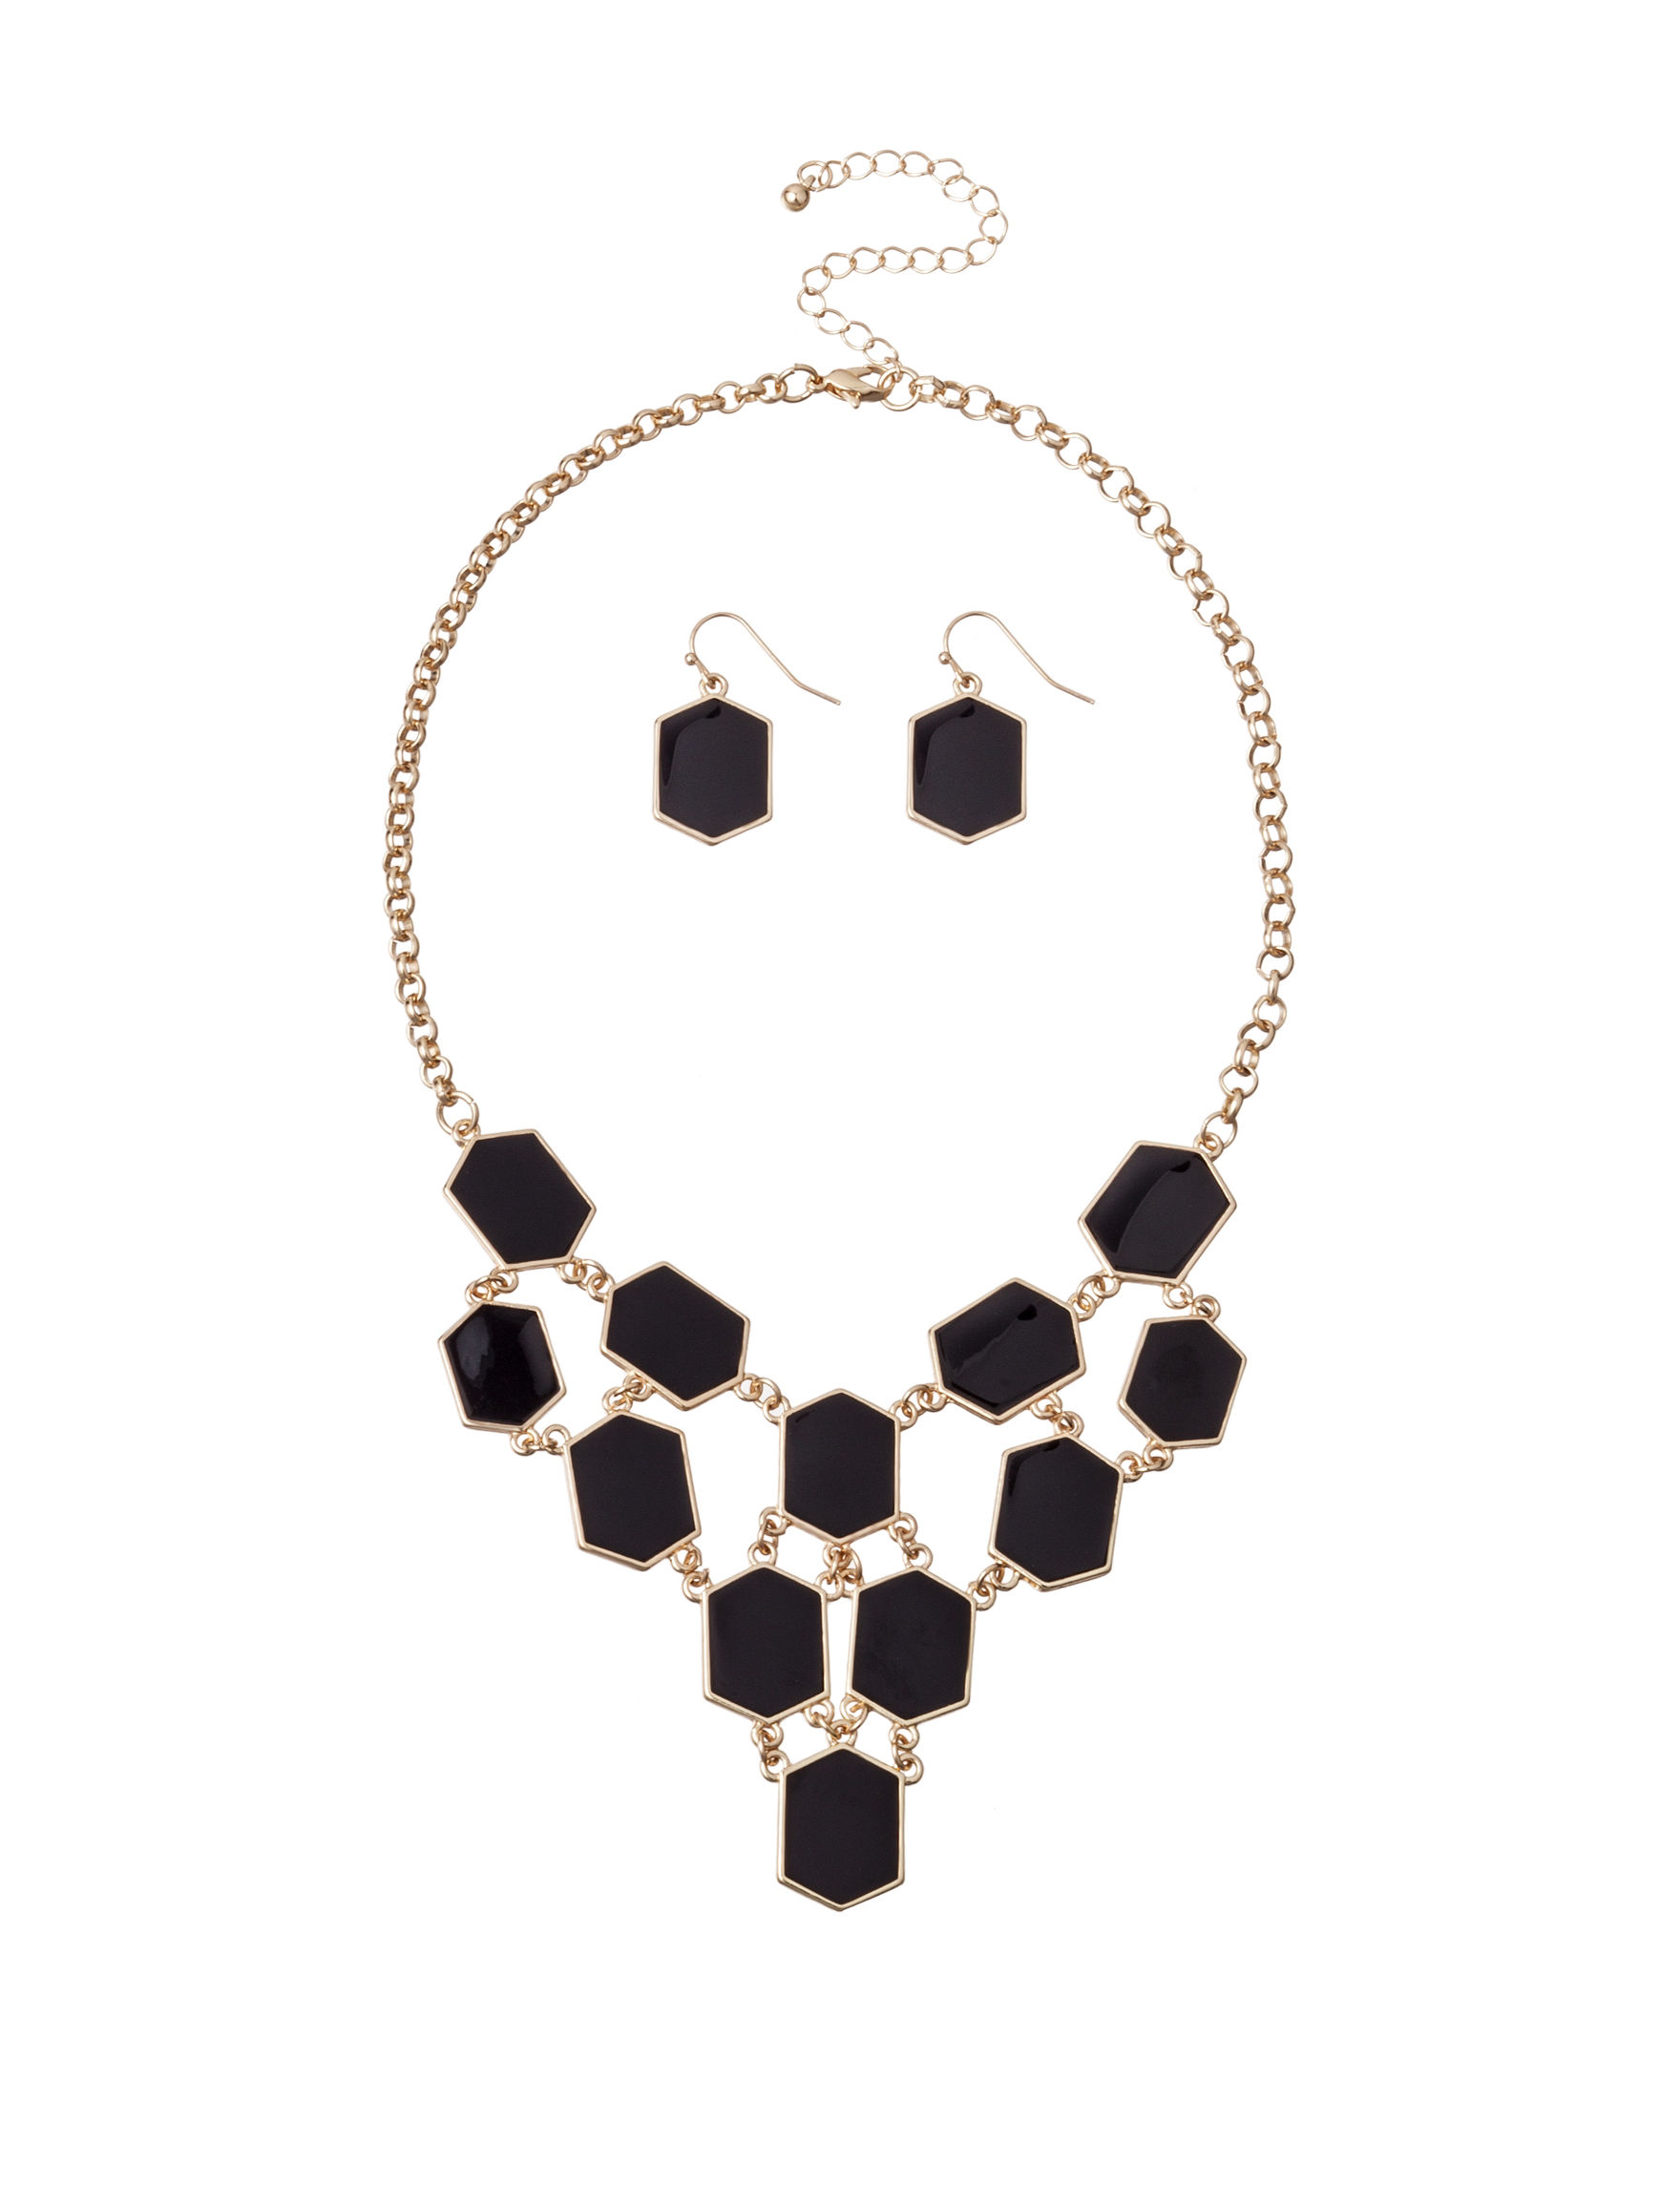 Hannah Black Necklaces & Pendants Fashion Jewelry